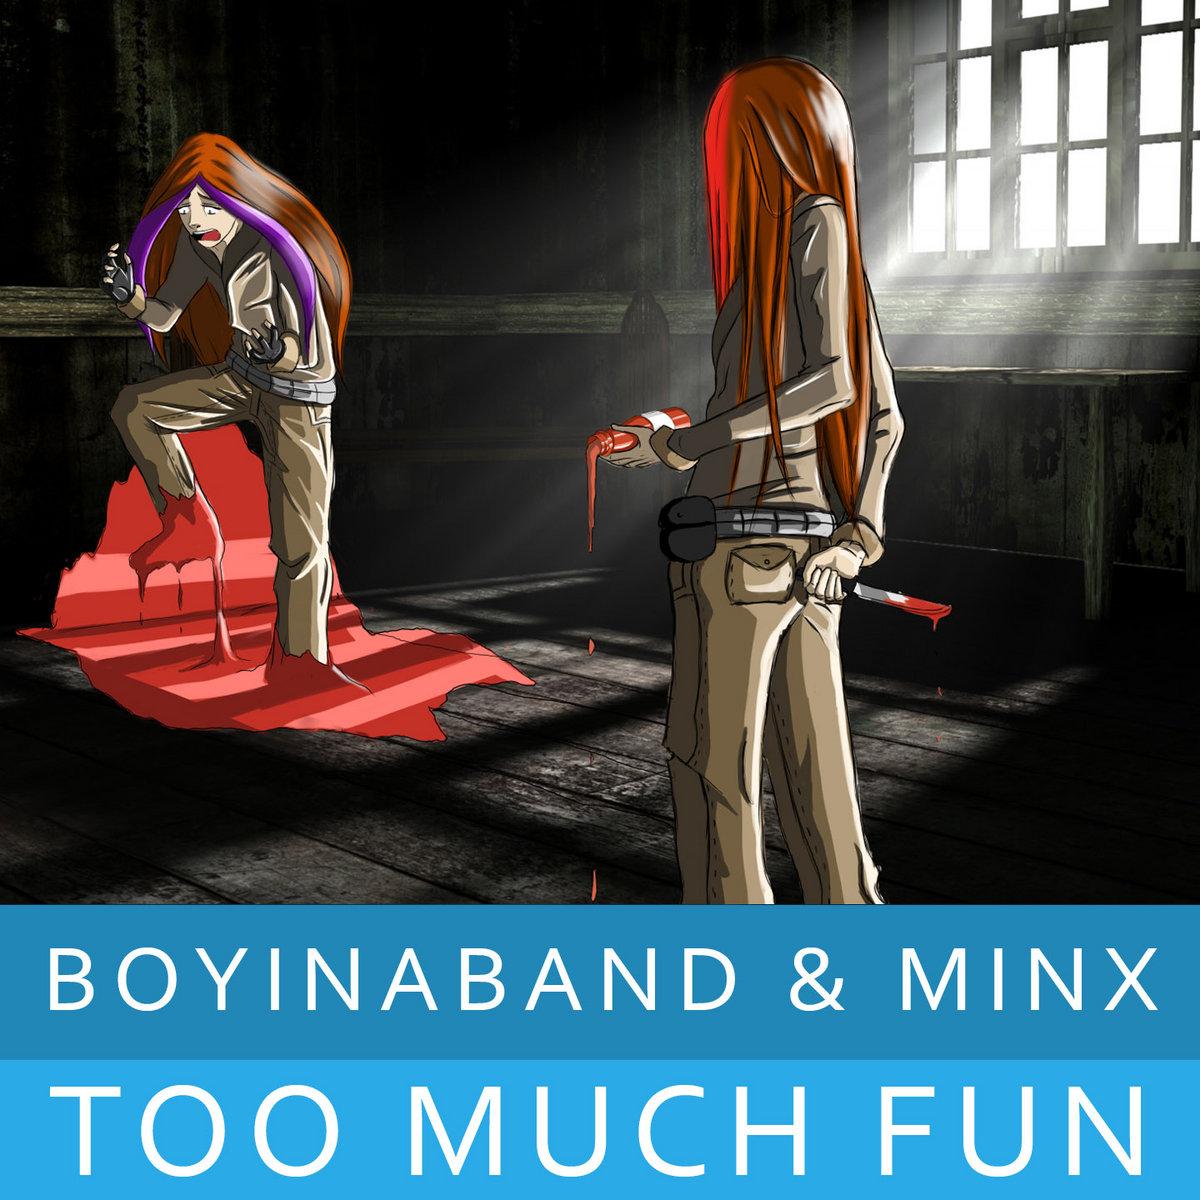 Image of: Boyinaband Official Boyinaband Bandcamp Too Much Fun Ft Minx Boyinaband